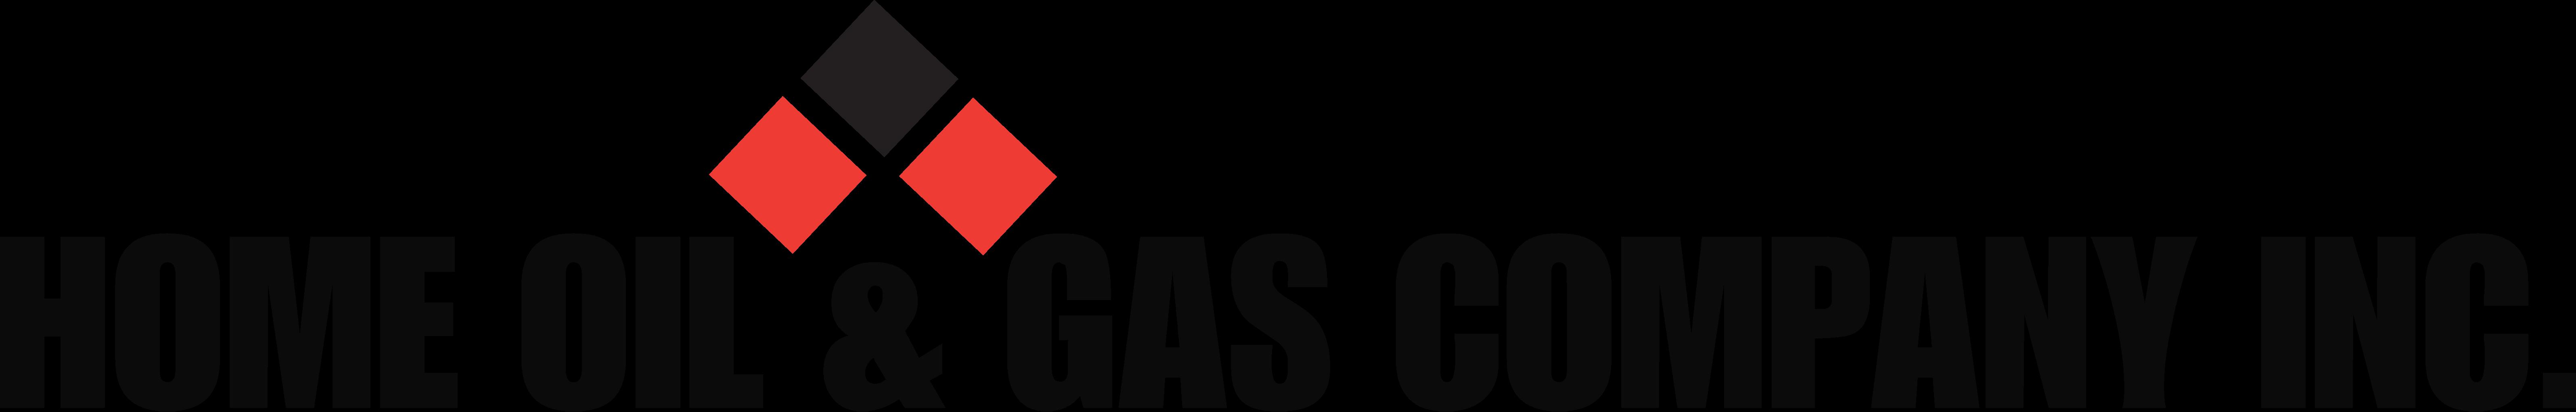 Home Oil & Gas Company, Inc